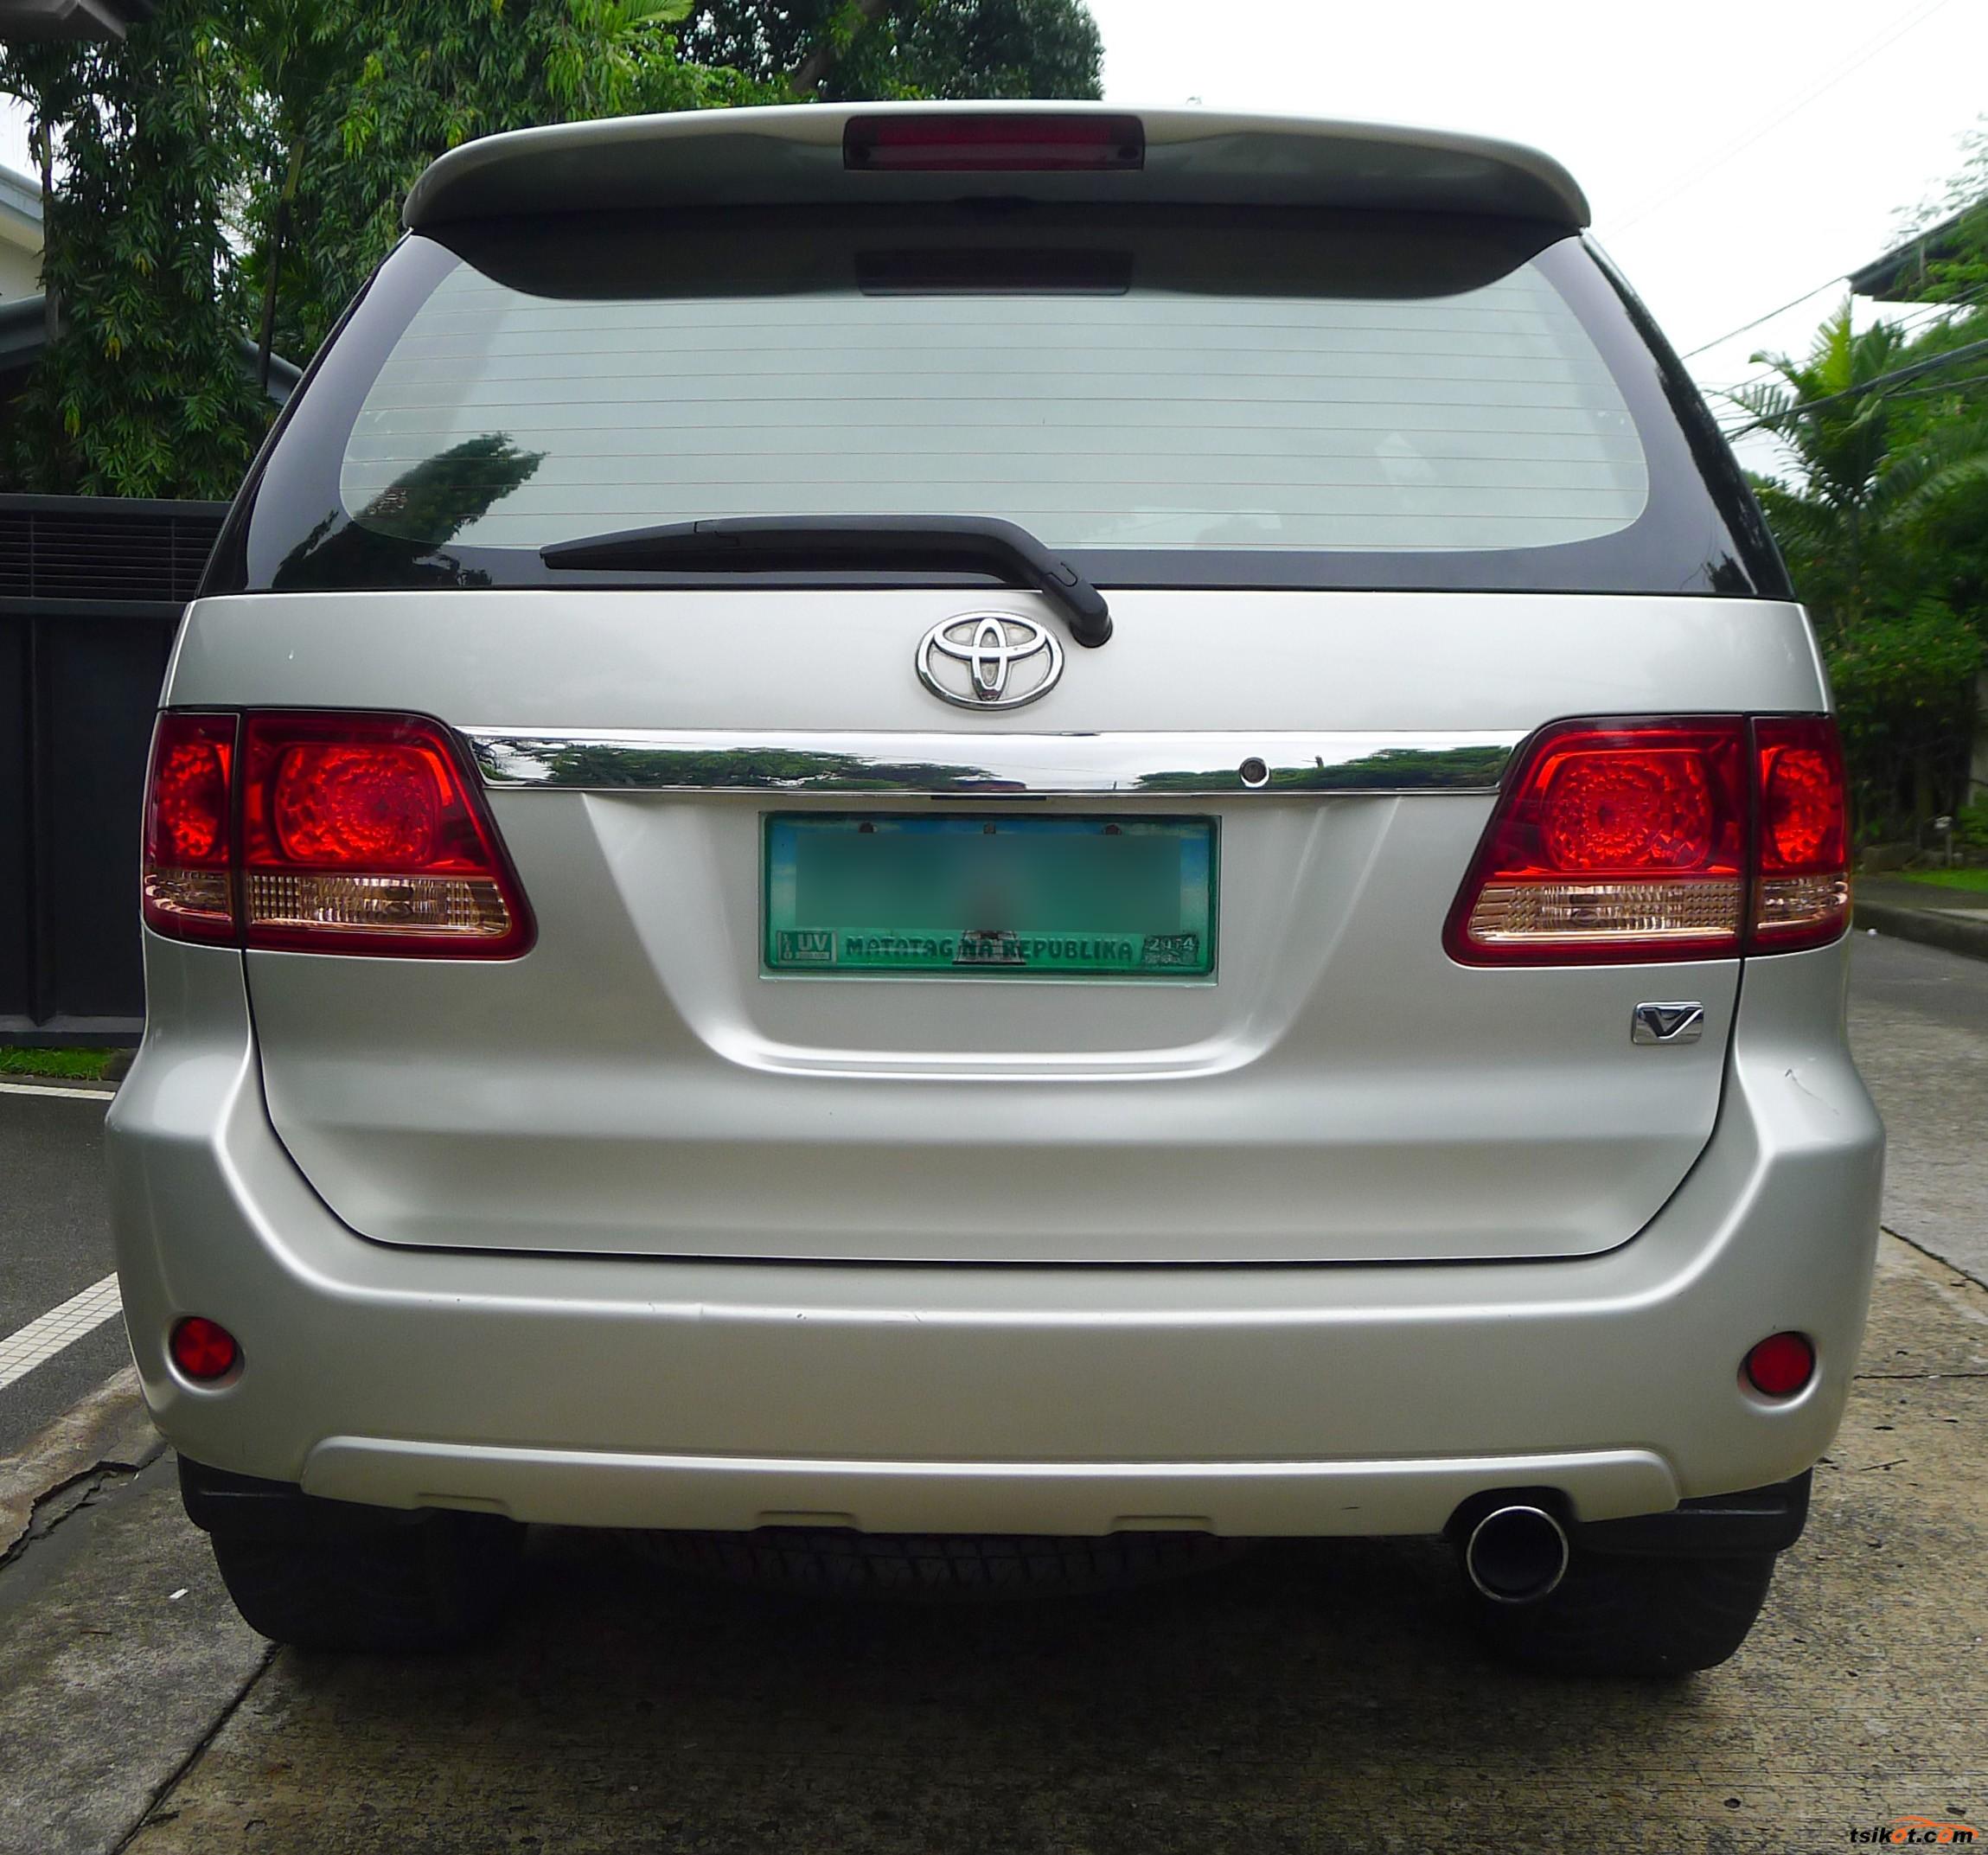 Toyota Fortuner 2005 - Car for Sale Metro Manila